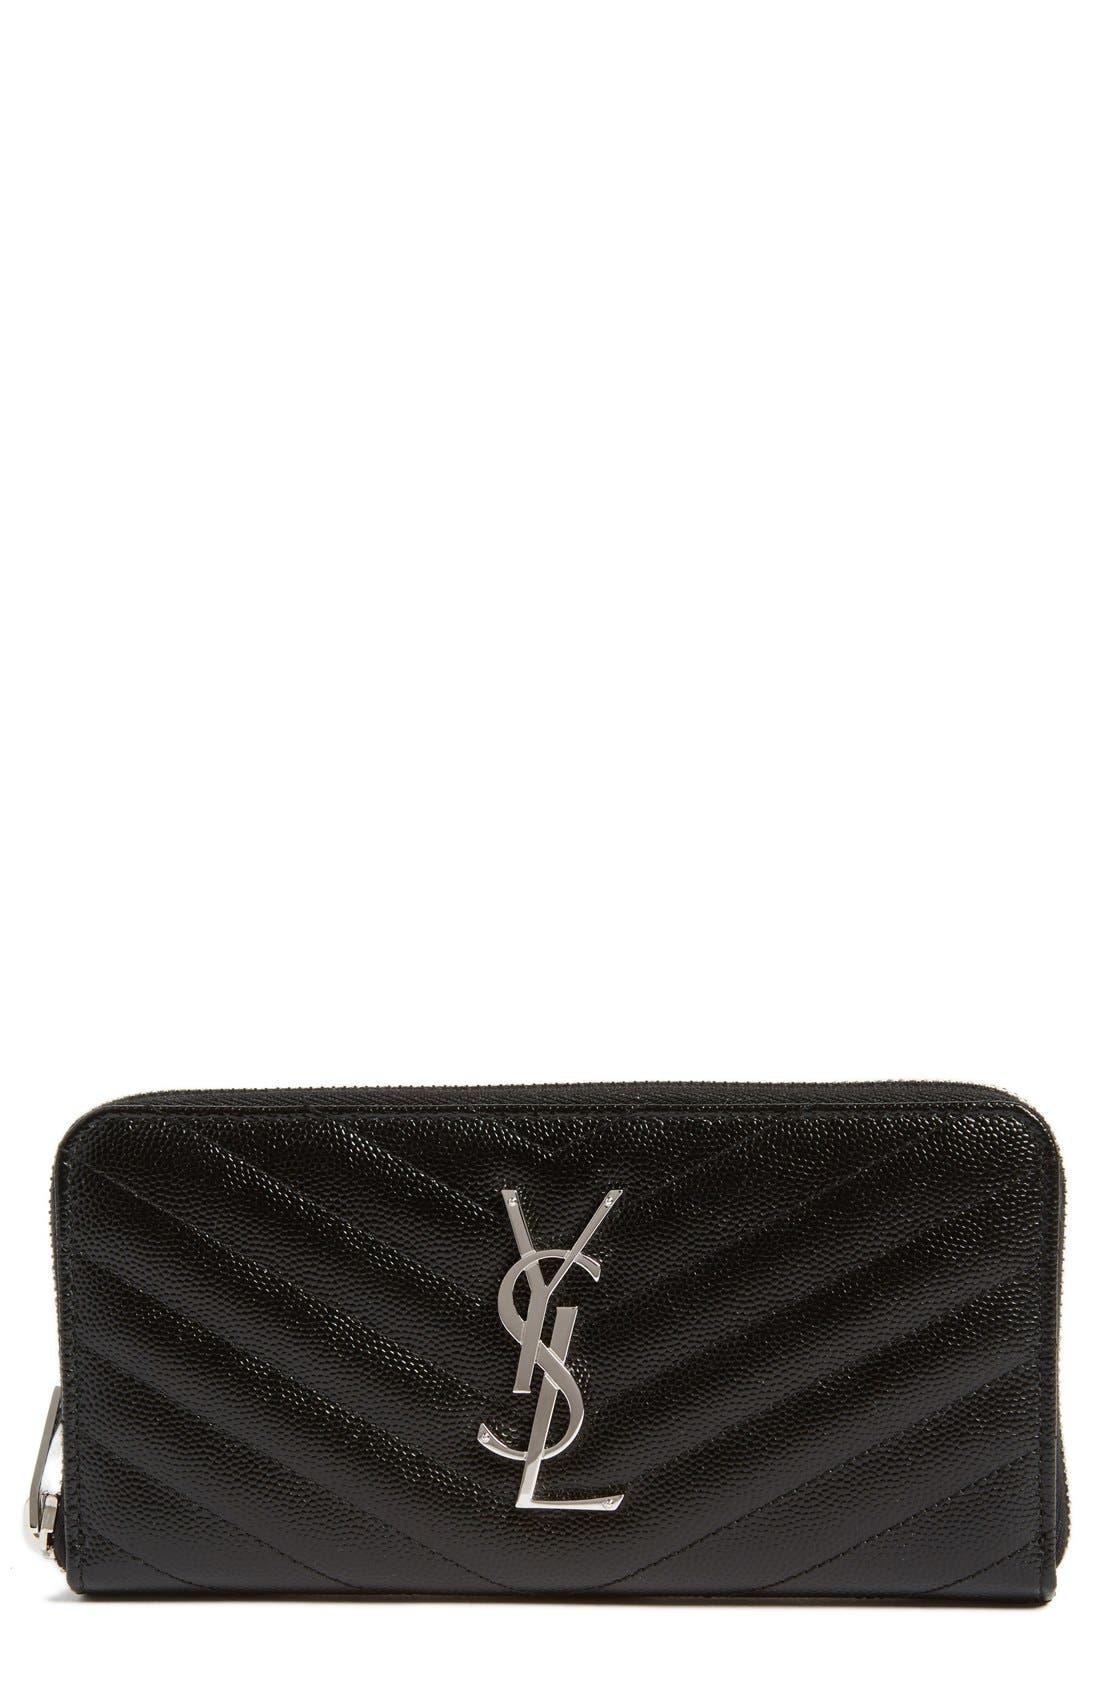 SAINT LAURENT 'Monogram' Zip Around Quilted Calfskin Leather